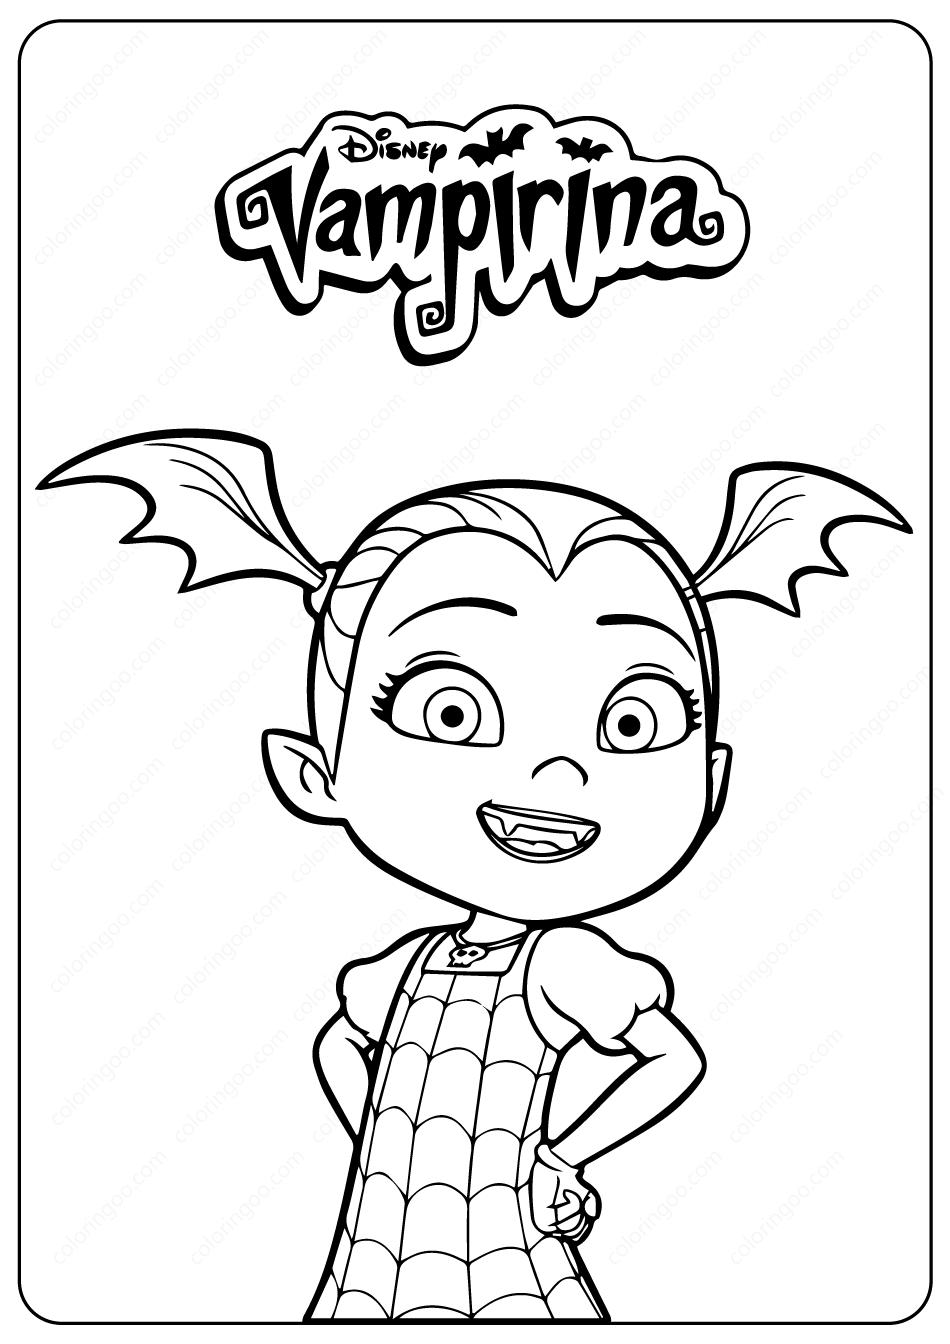 Disney Junior Vampirina PDF Coloring Pages